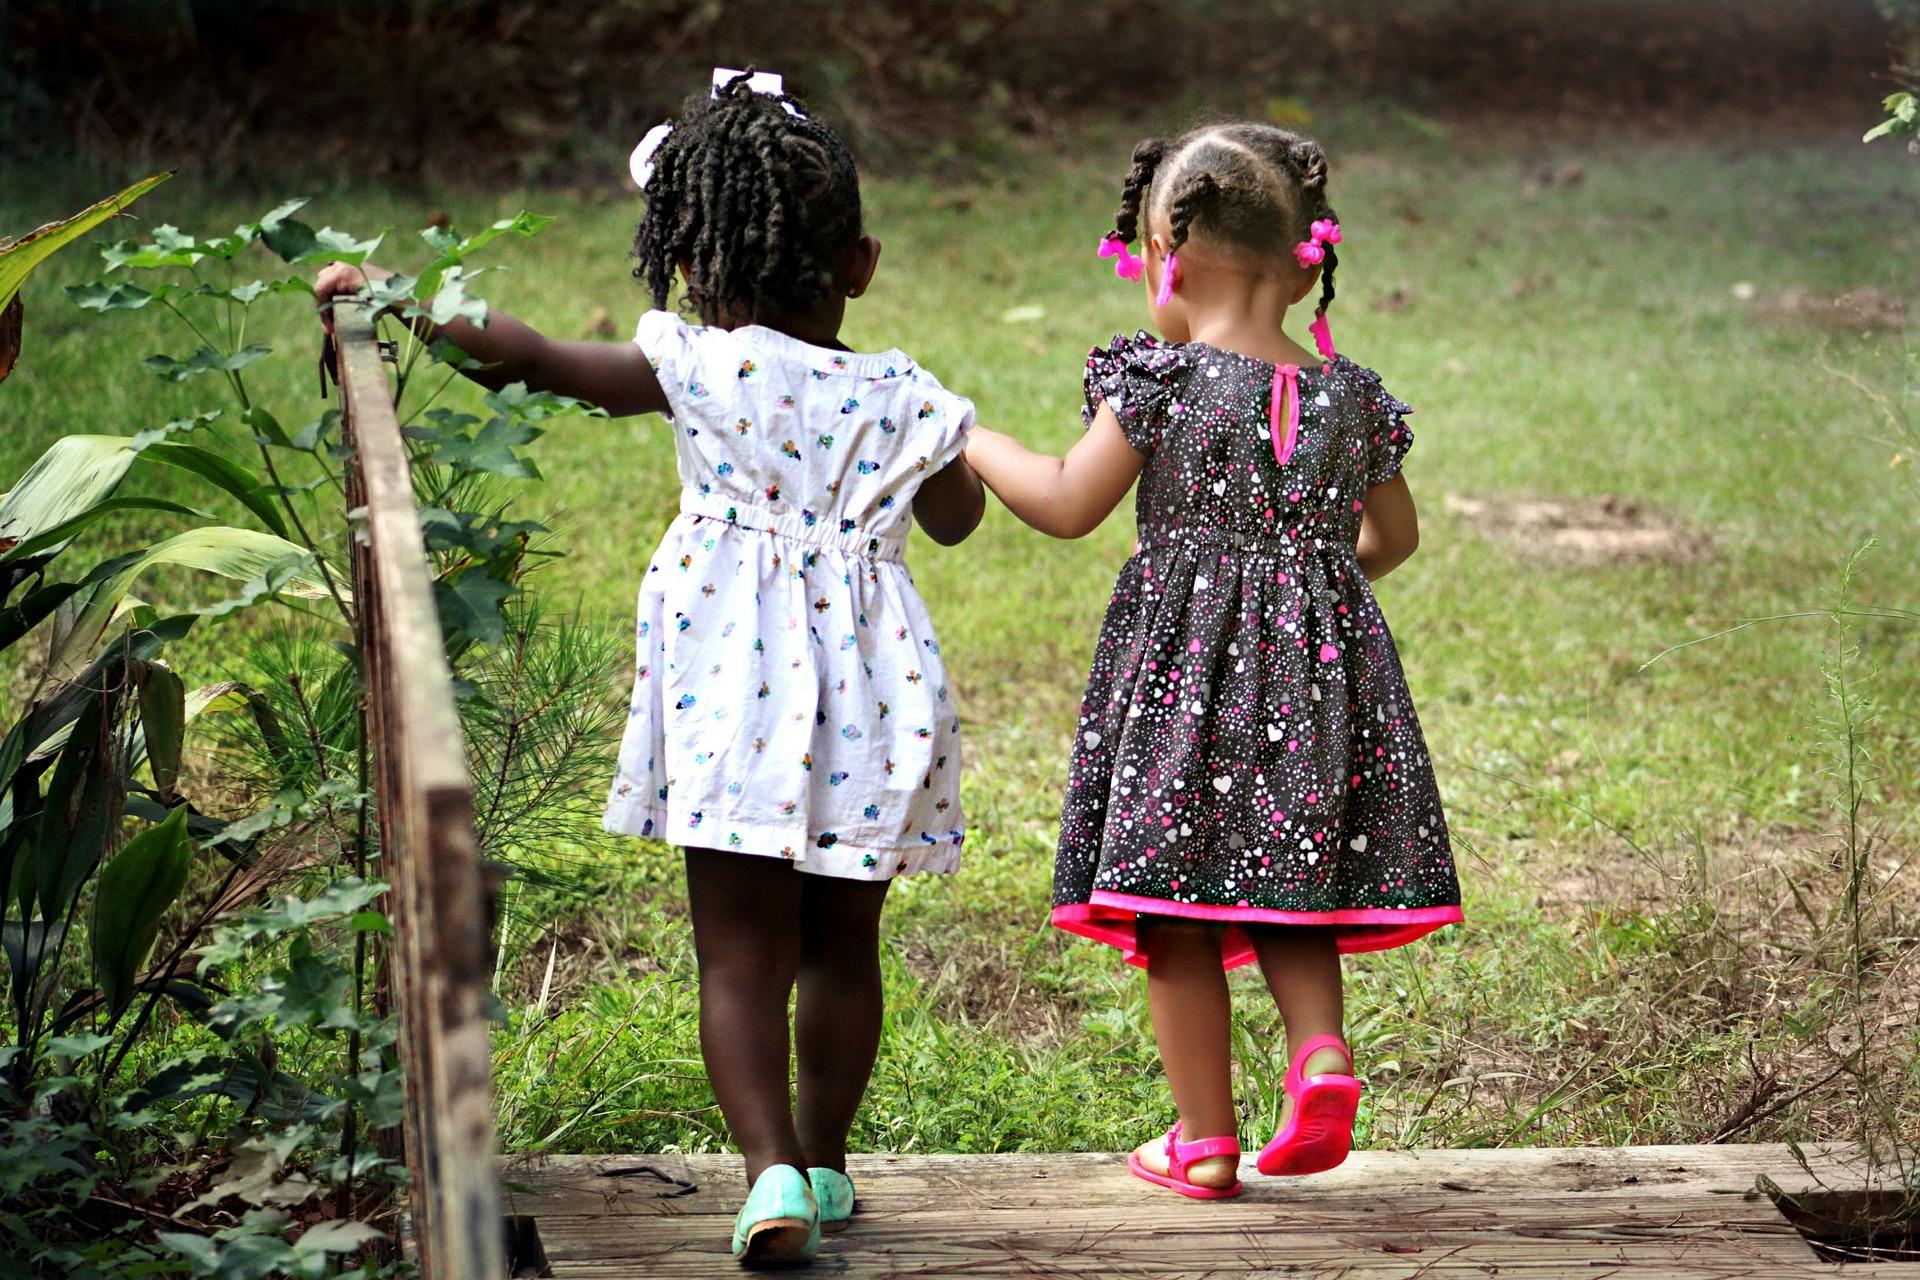 Pretending isn't just child's play